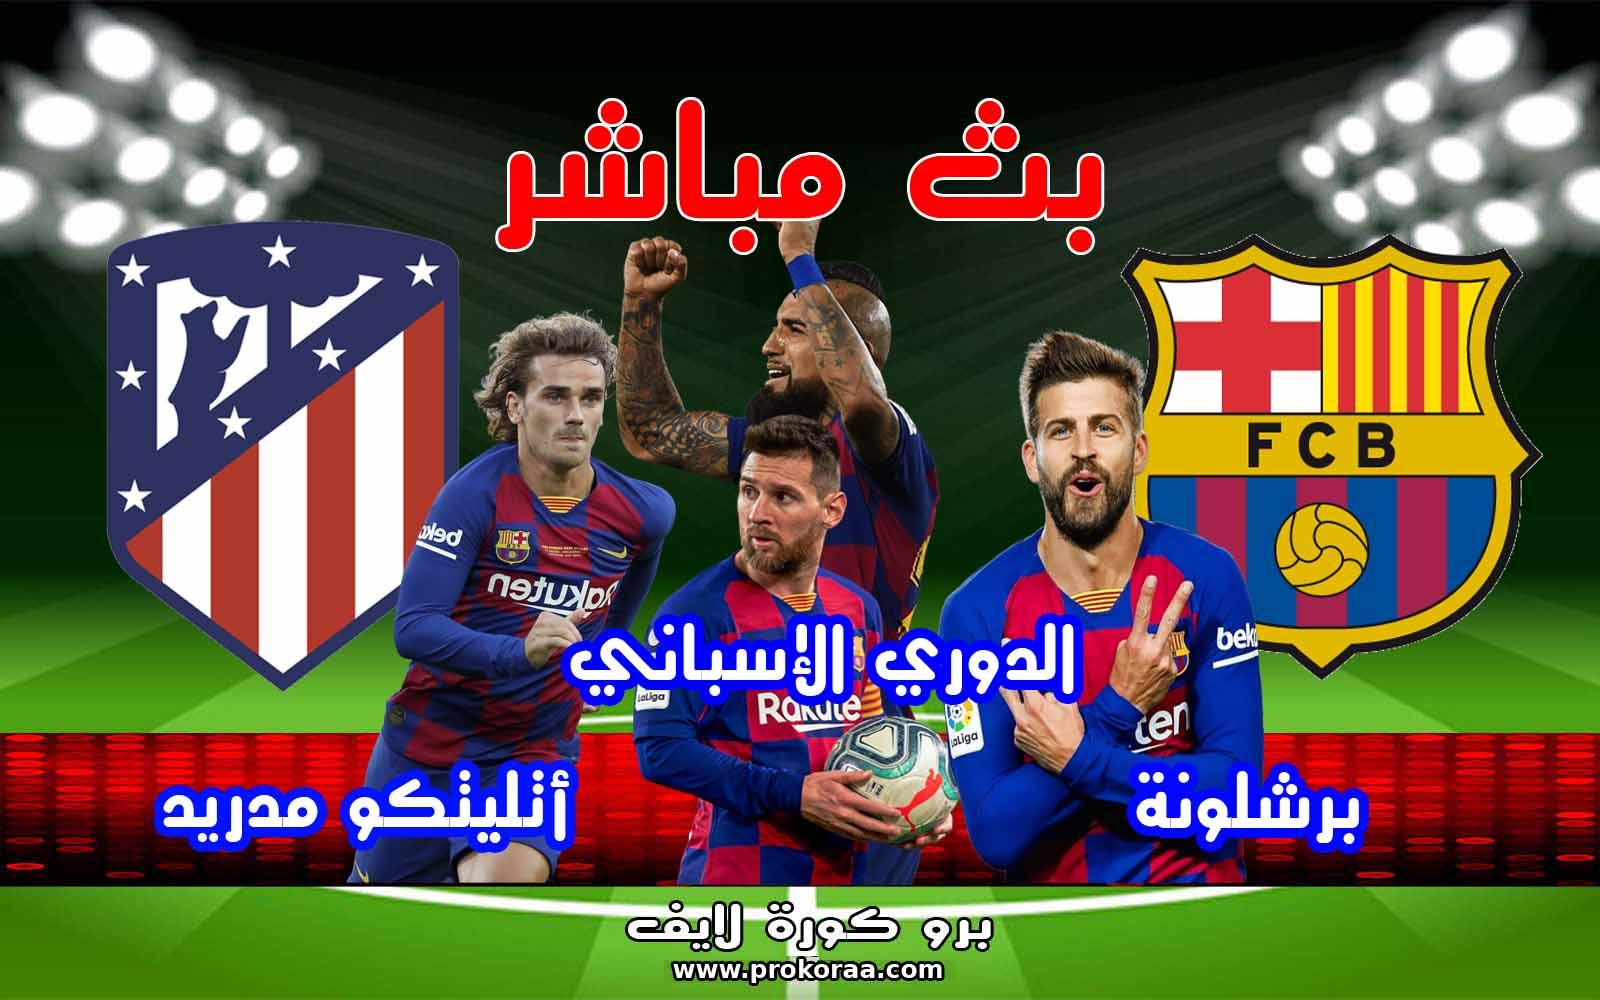 مشاهدة مباراة برشلونة واتليتكو مدريد بث مباشر